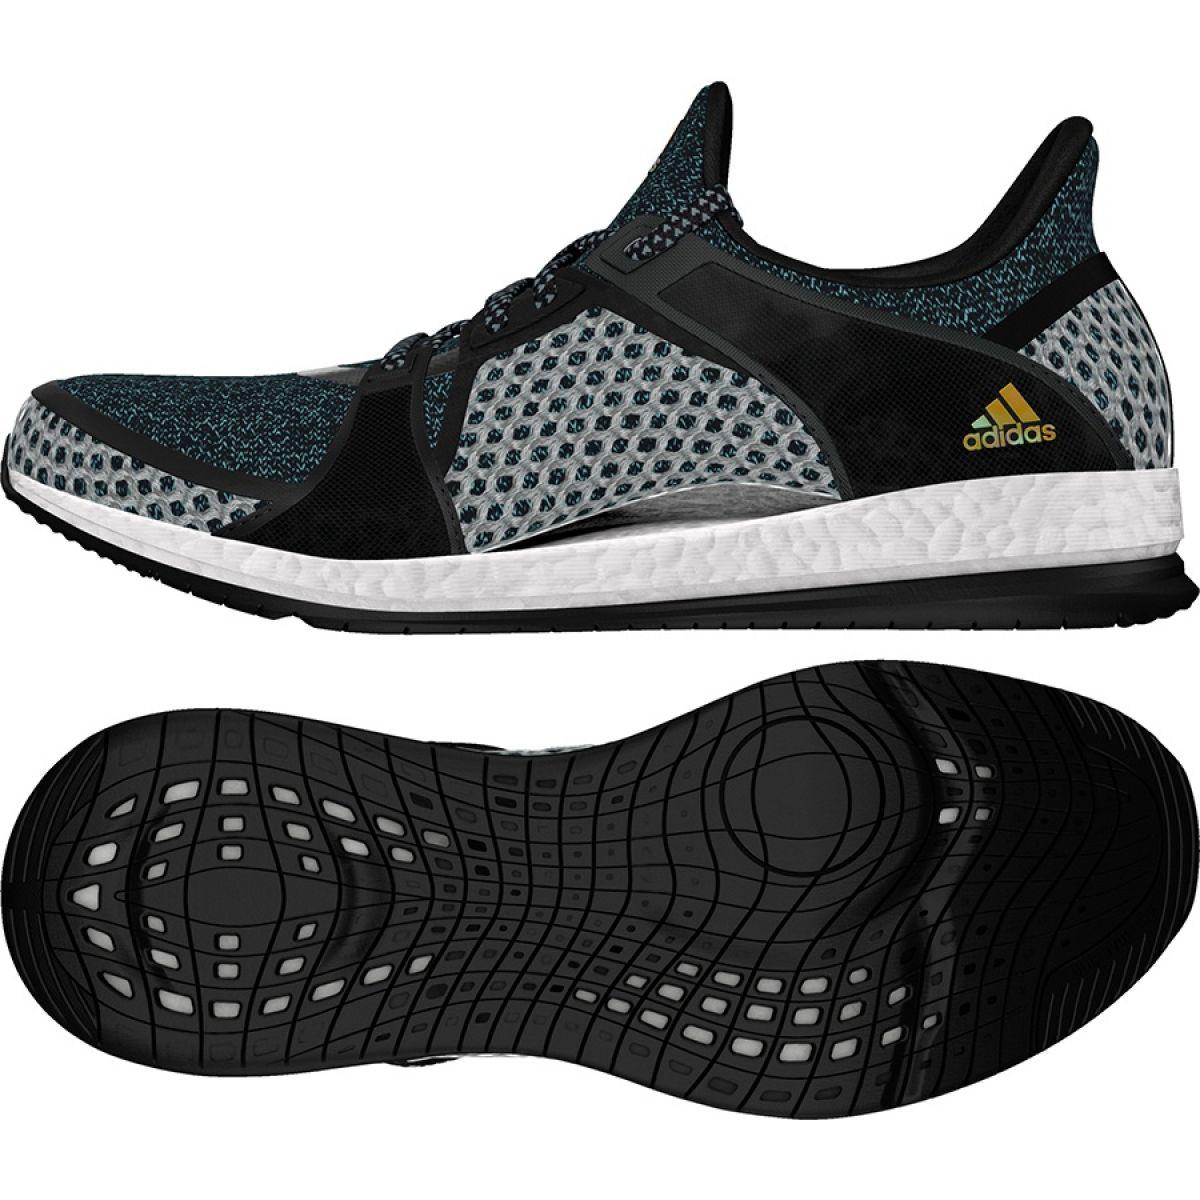 e90feb042183c Buty adidas Pure Boost X Training W AQ4596 36 2/3 - 7138902451 ...